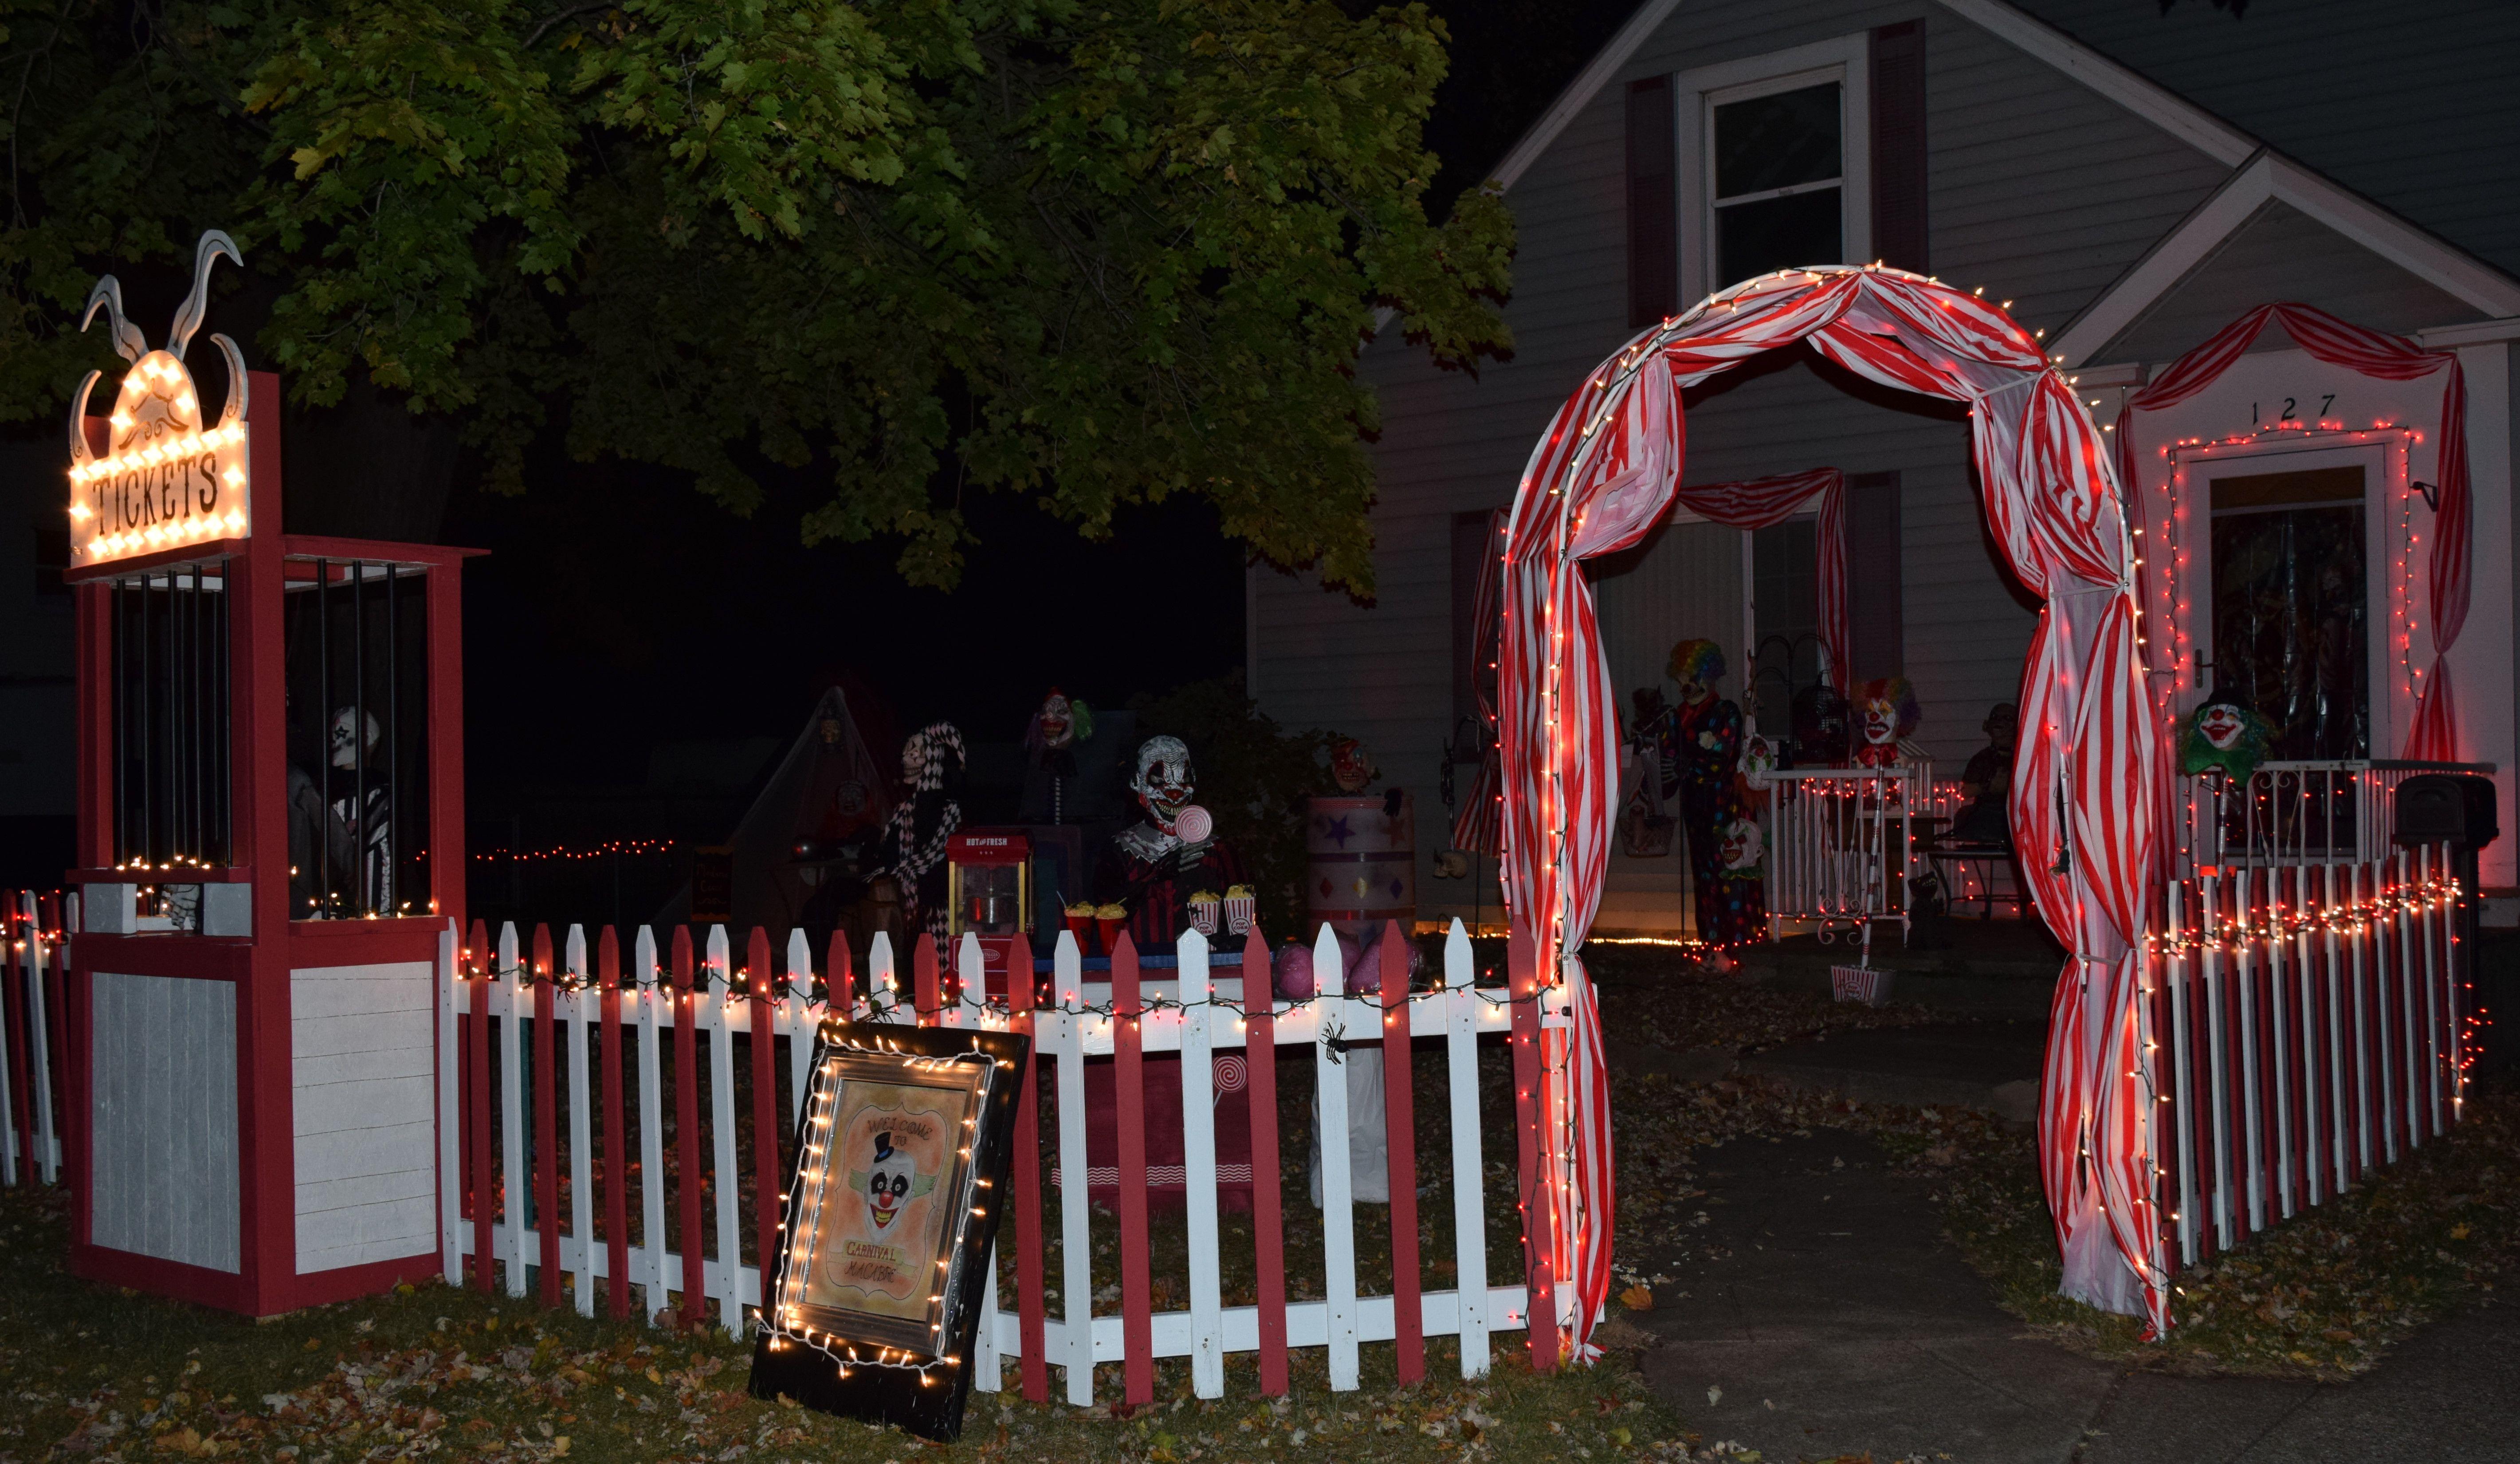 Creepy clown halloween decorations halloween Pinterest Creepy - halloween house decoration ideas